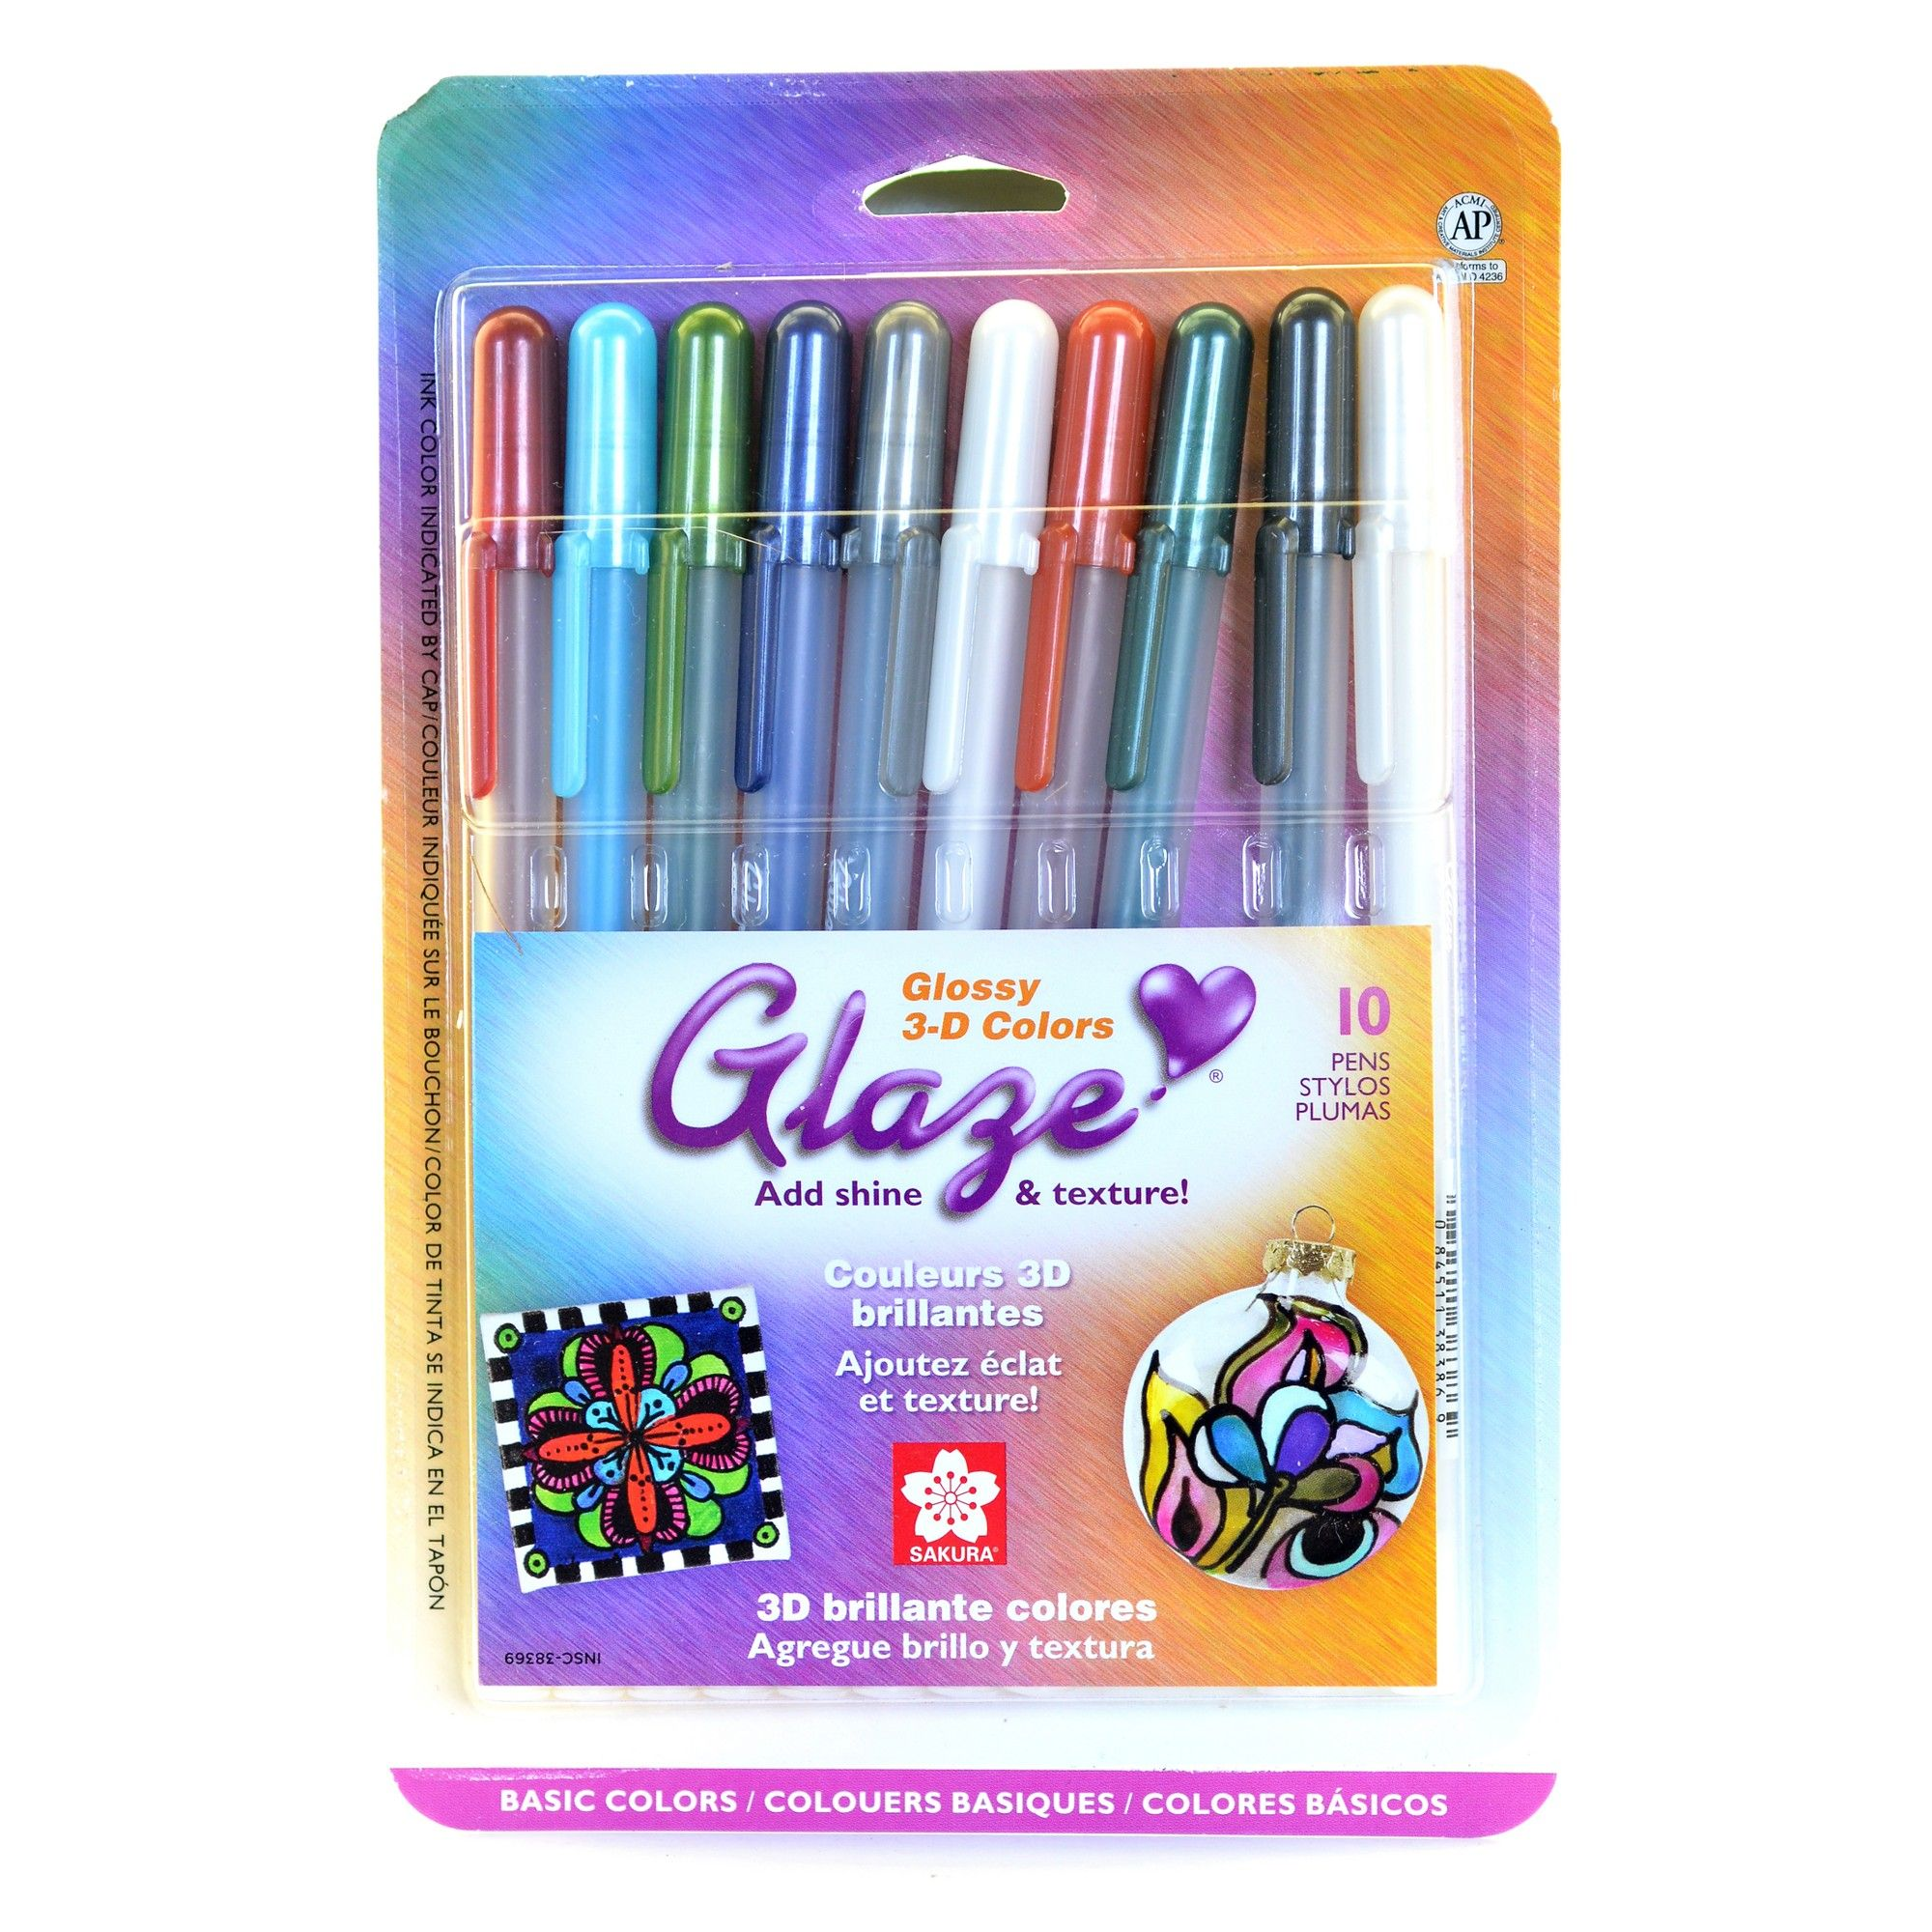 10ct Glossy 3d Colors Glaze Gel Pen Set Multicolor Gel Pens Set Gel Pens Pen Sets